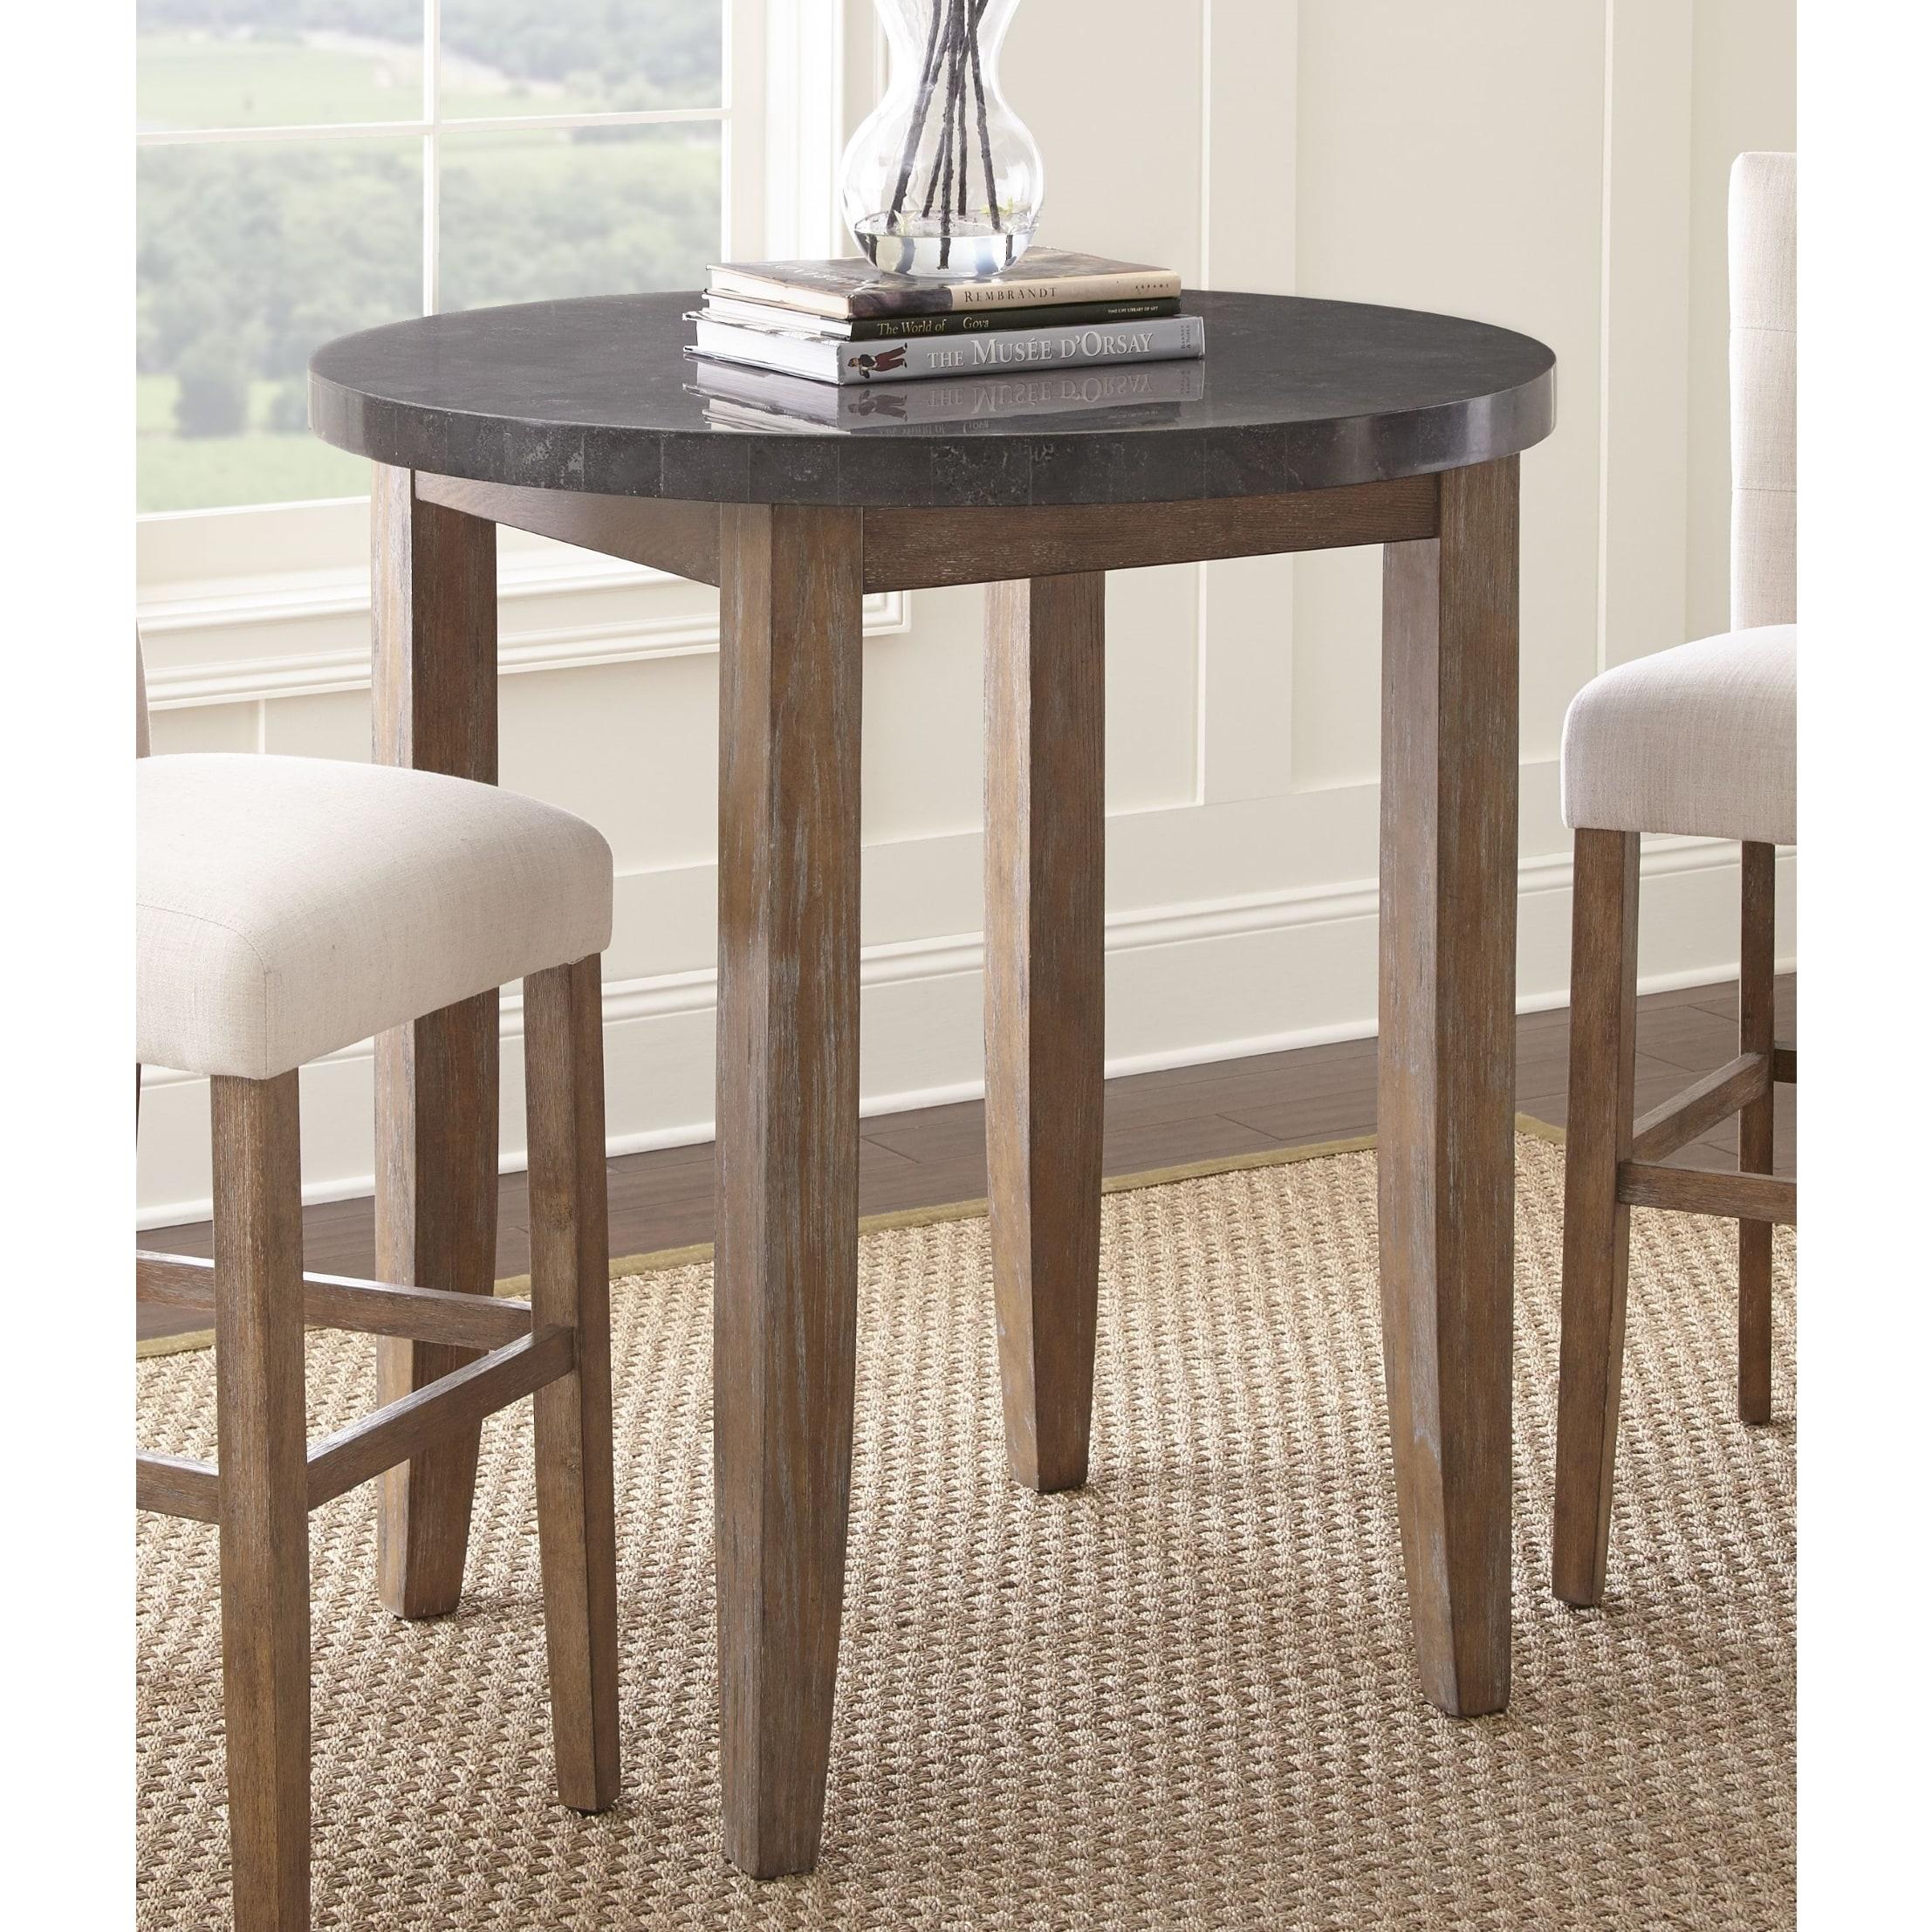 Shop Danni 40 Inch Round Stone Top Pub Table By Greyson